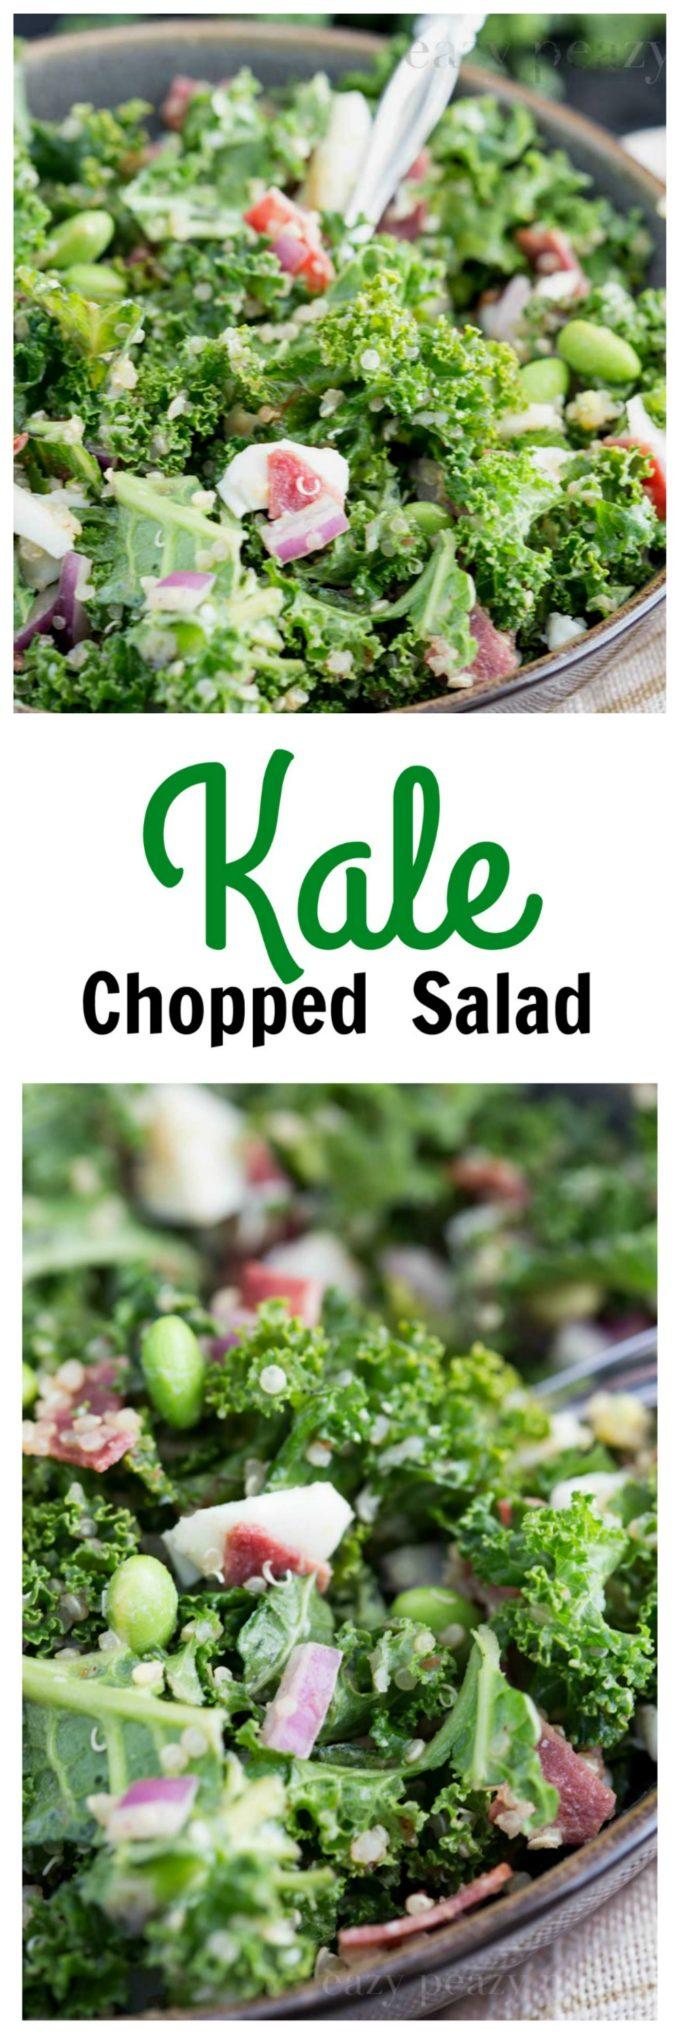 PIN Kale chopped salad